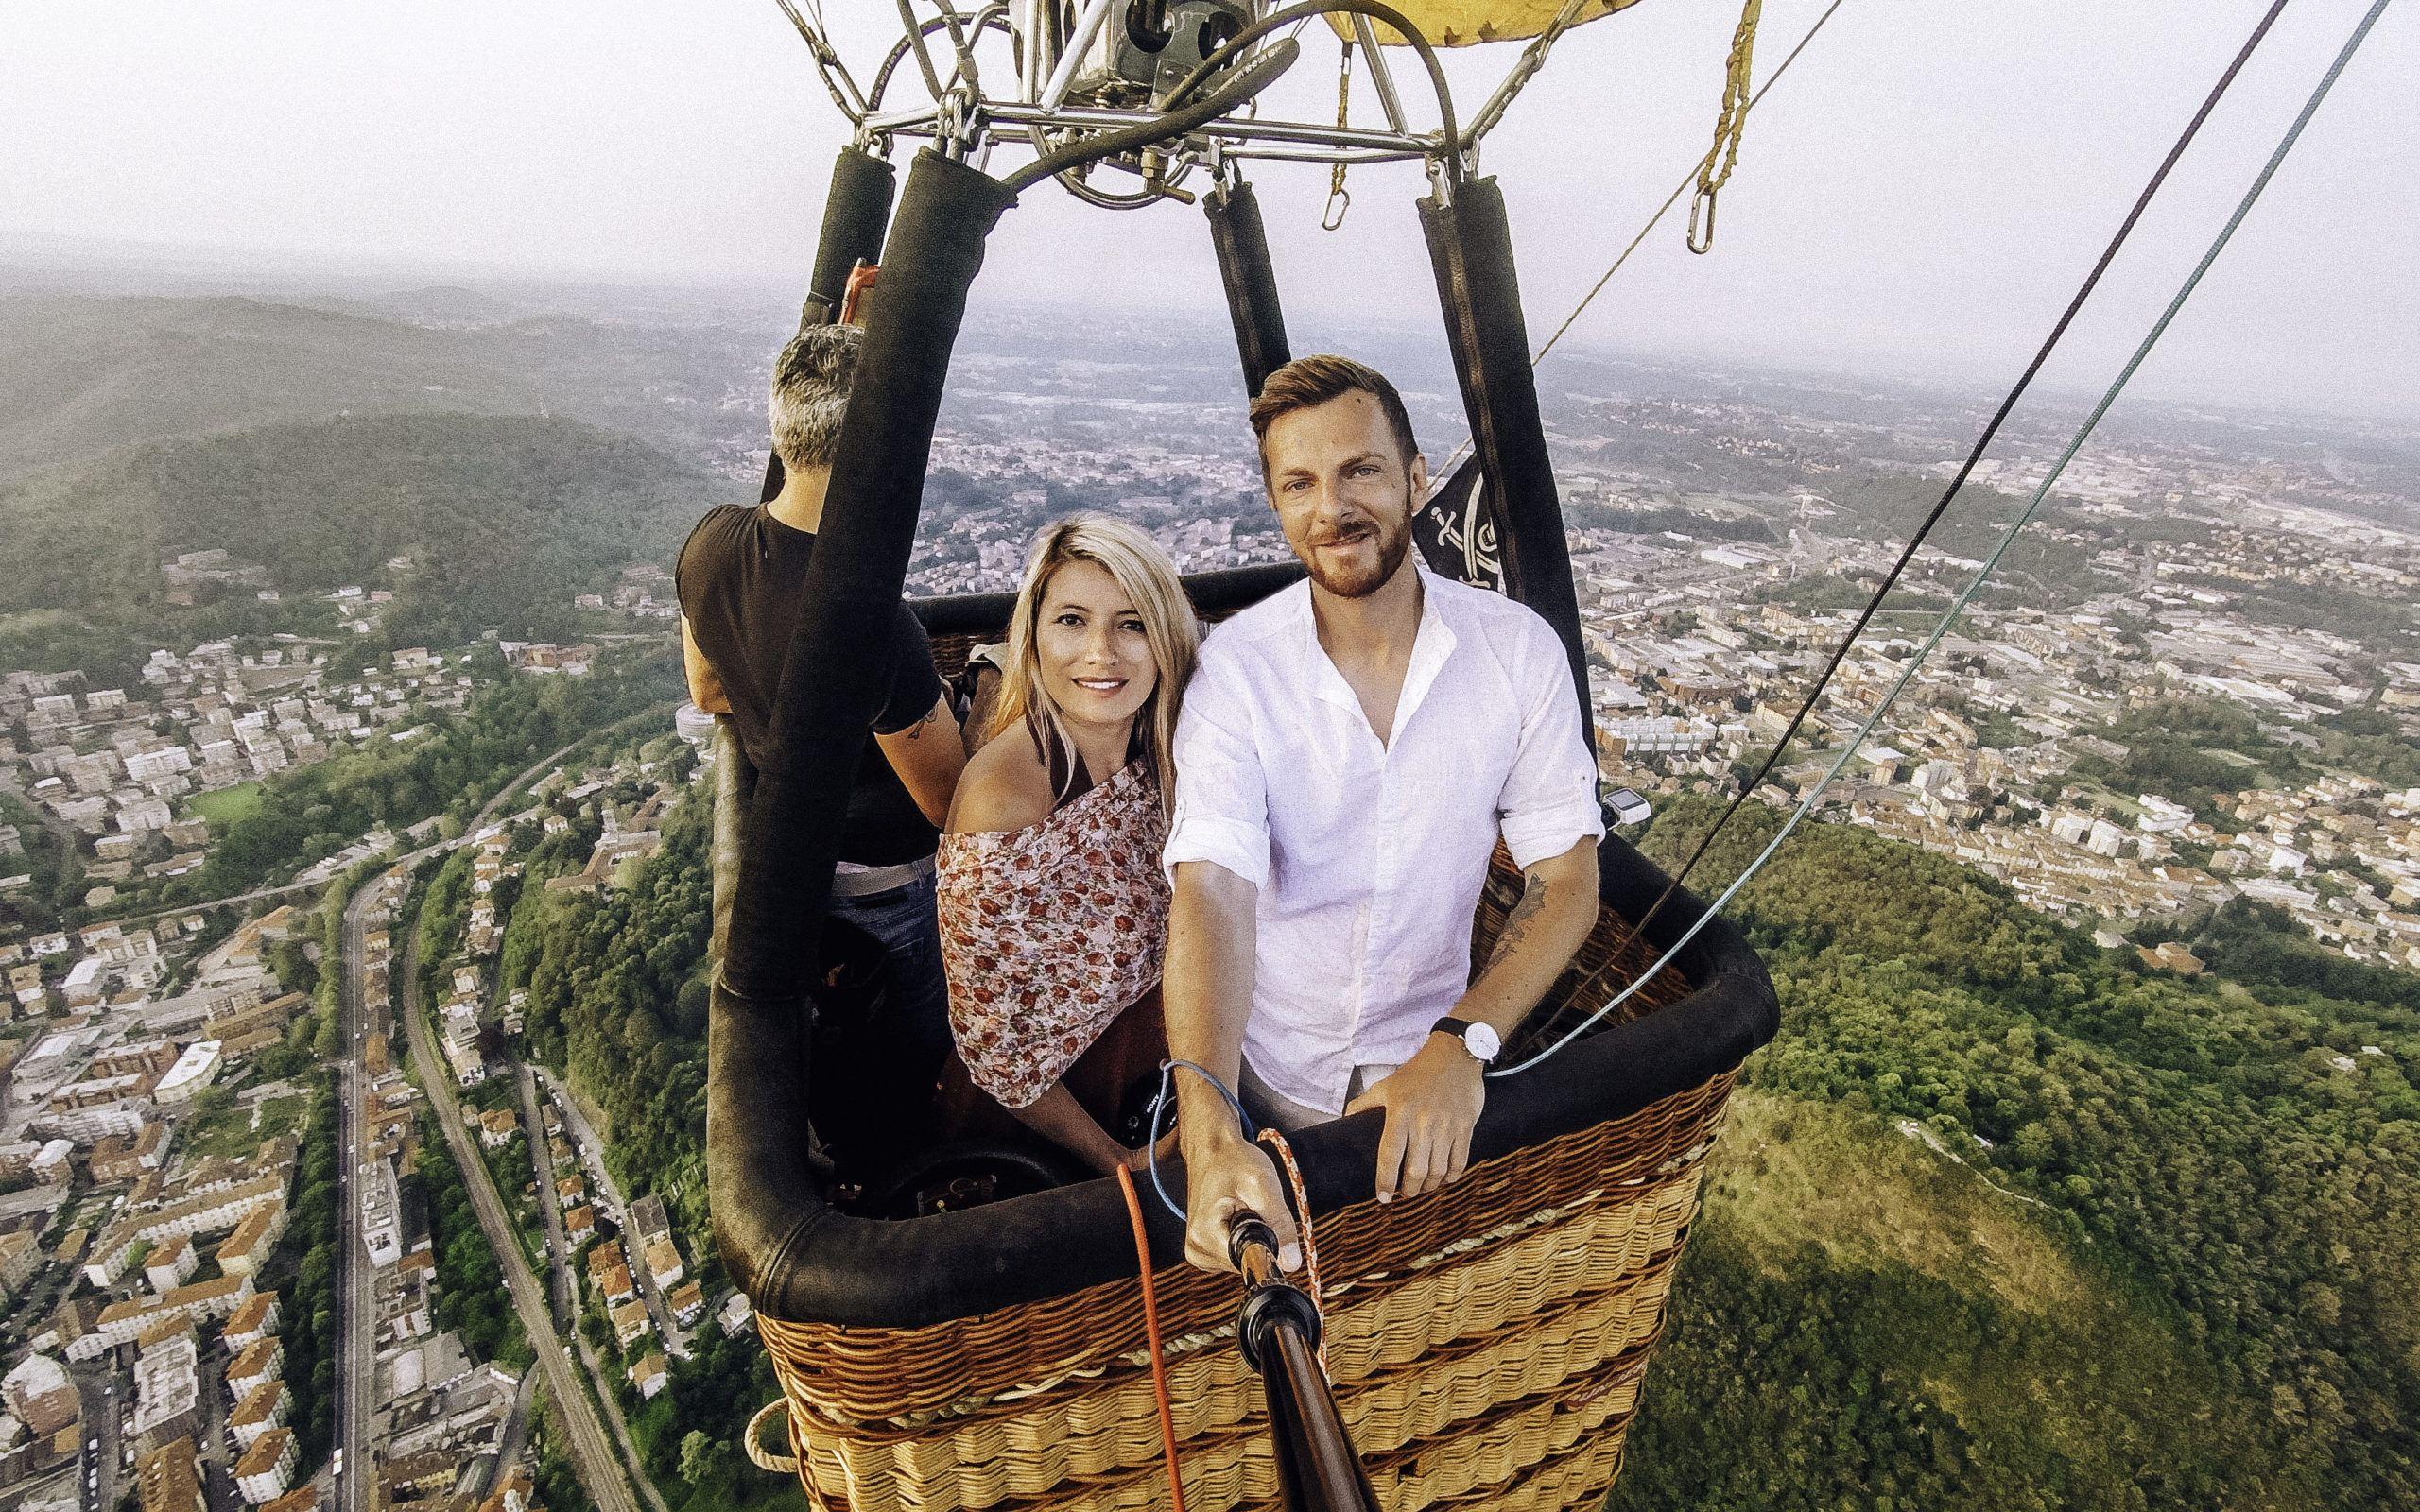 Couple on Hot Air Balloon